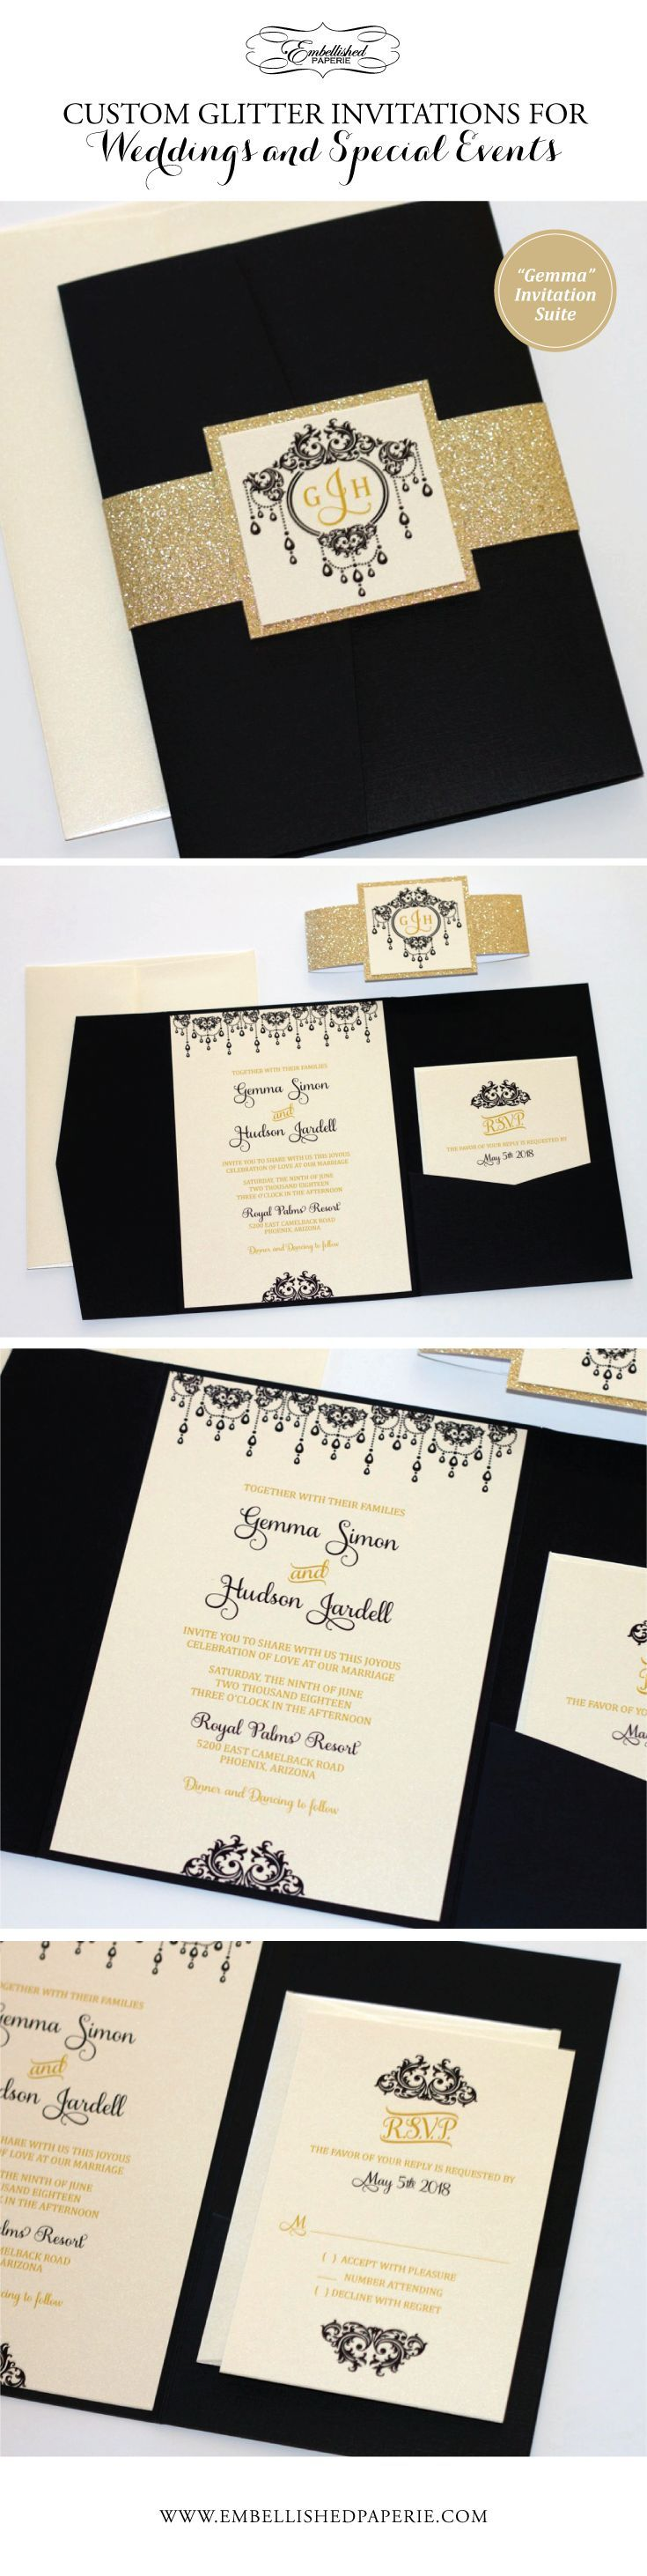 Elegant Glitter Wedding Invitation - Ivory, Black and Gold Glitter ...